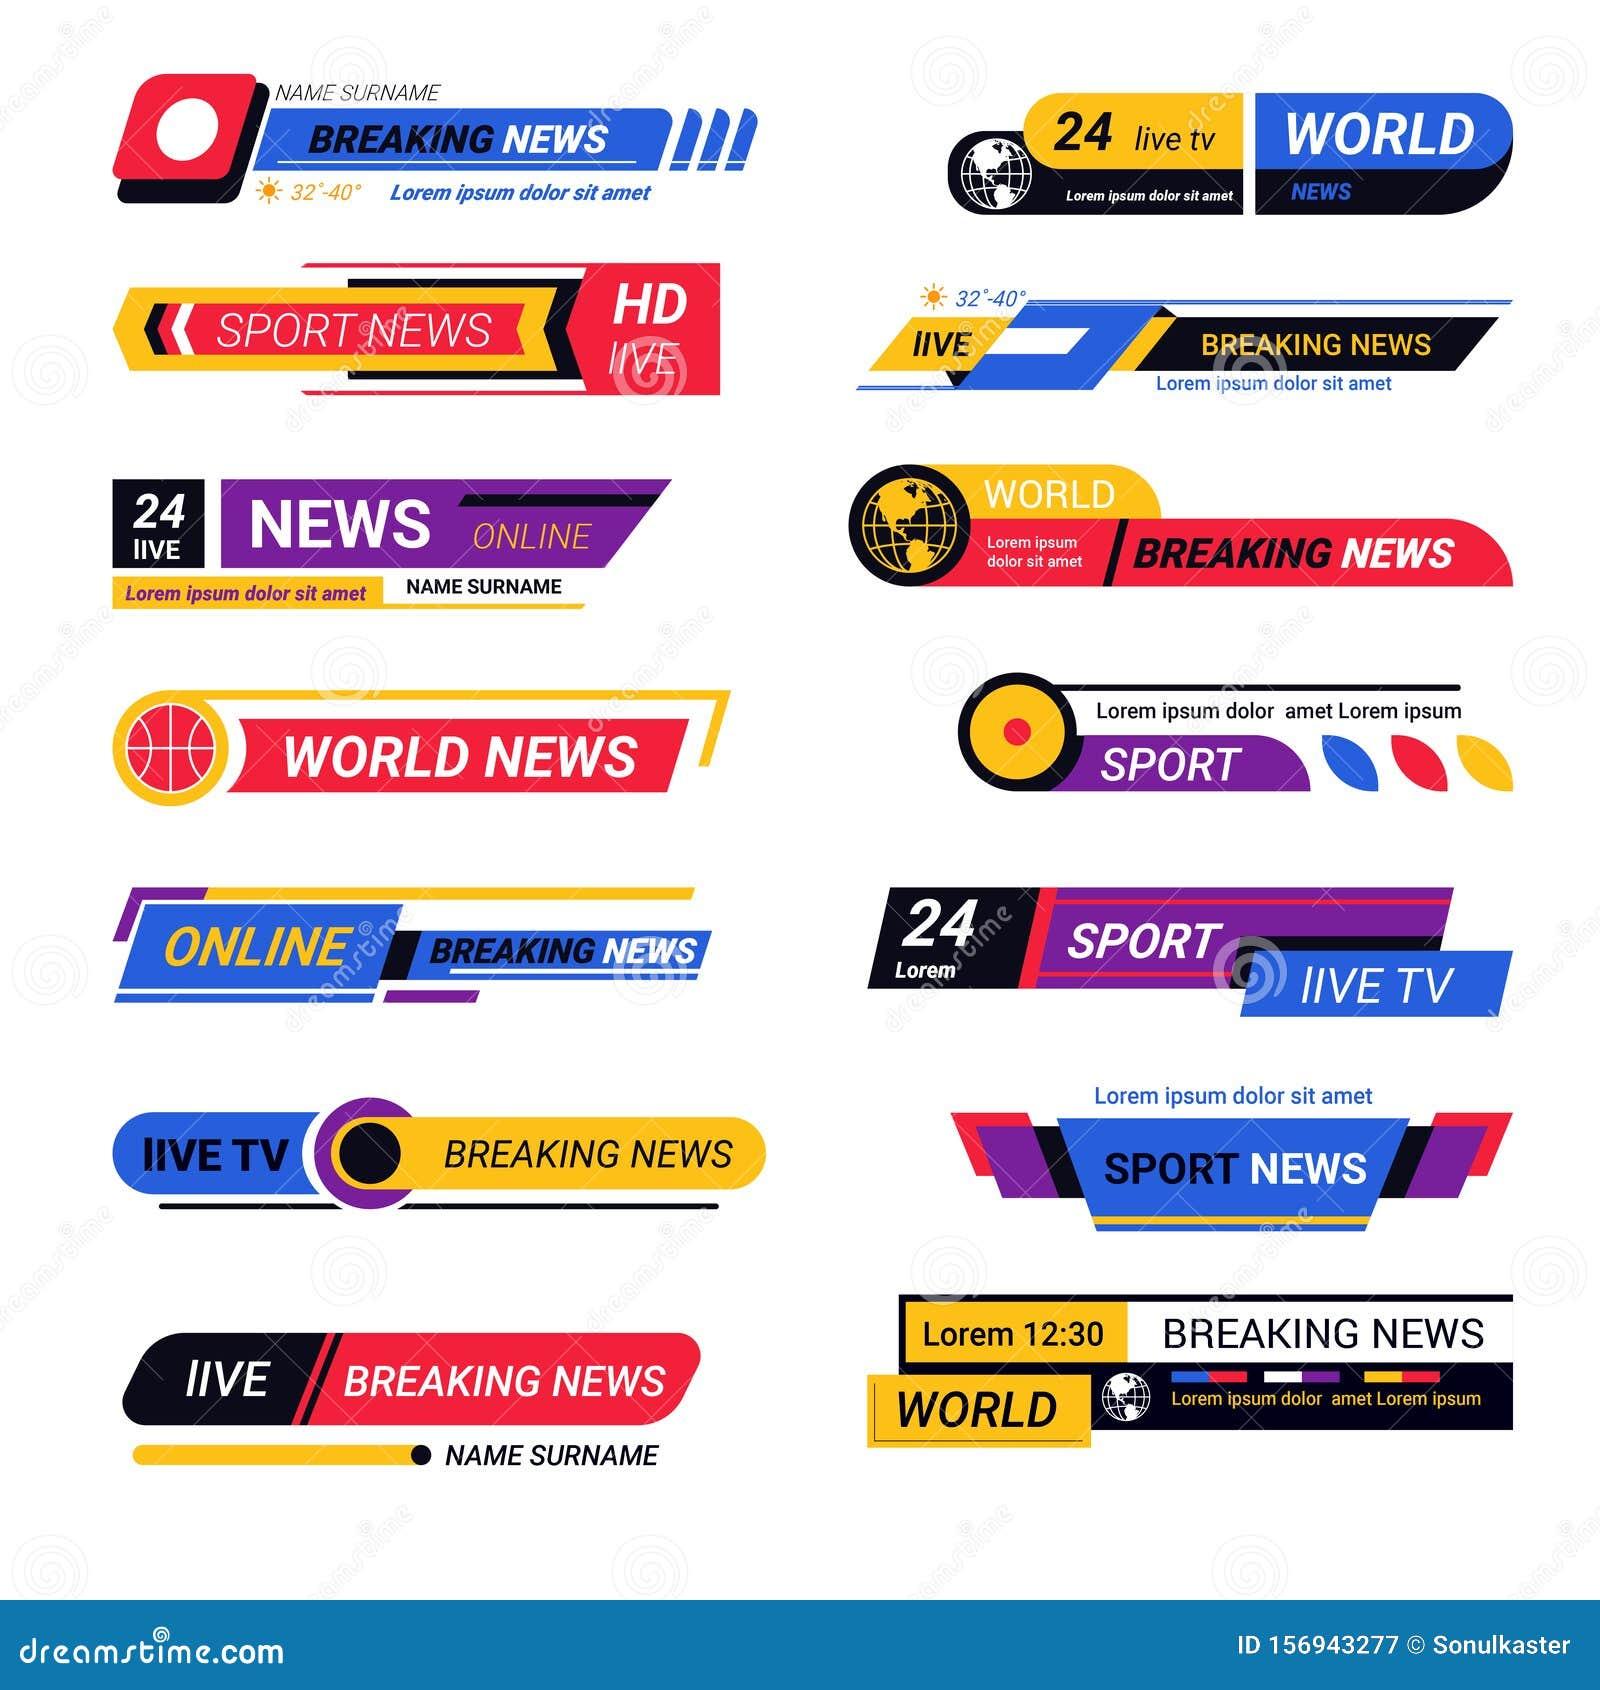 Latest News Header: TV Live Report Headers, Breaking News Titles Or Bars Stock